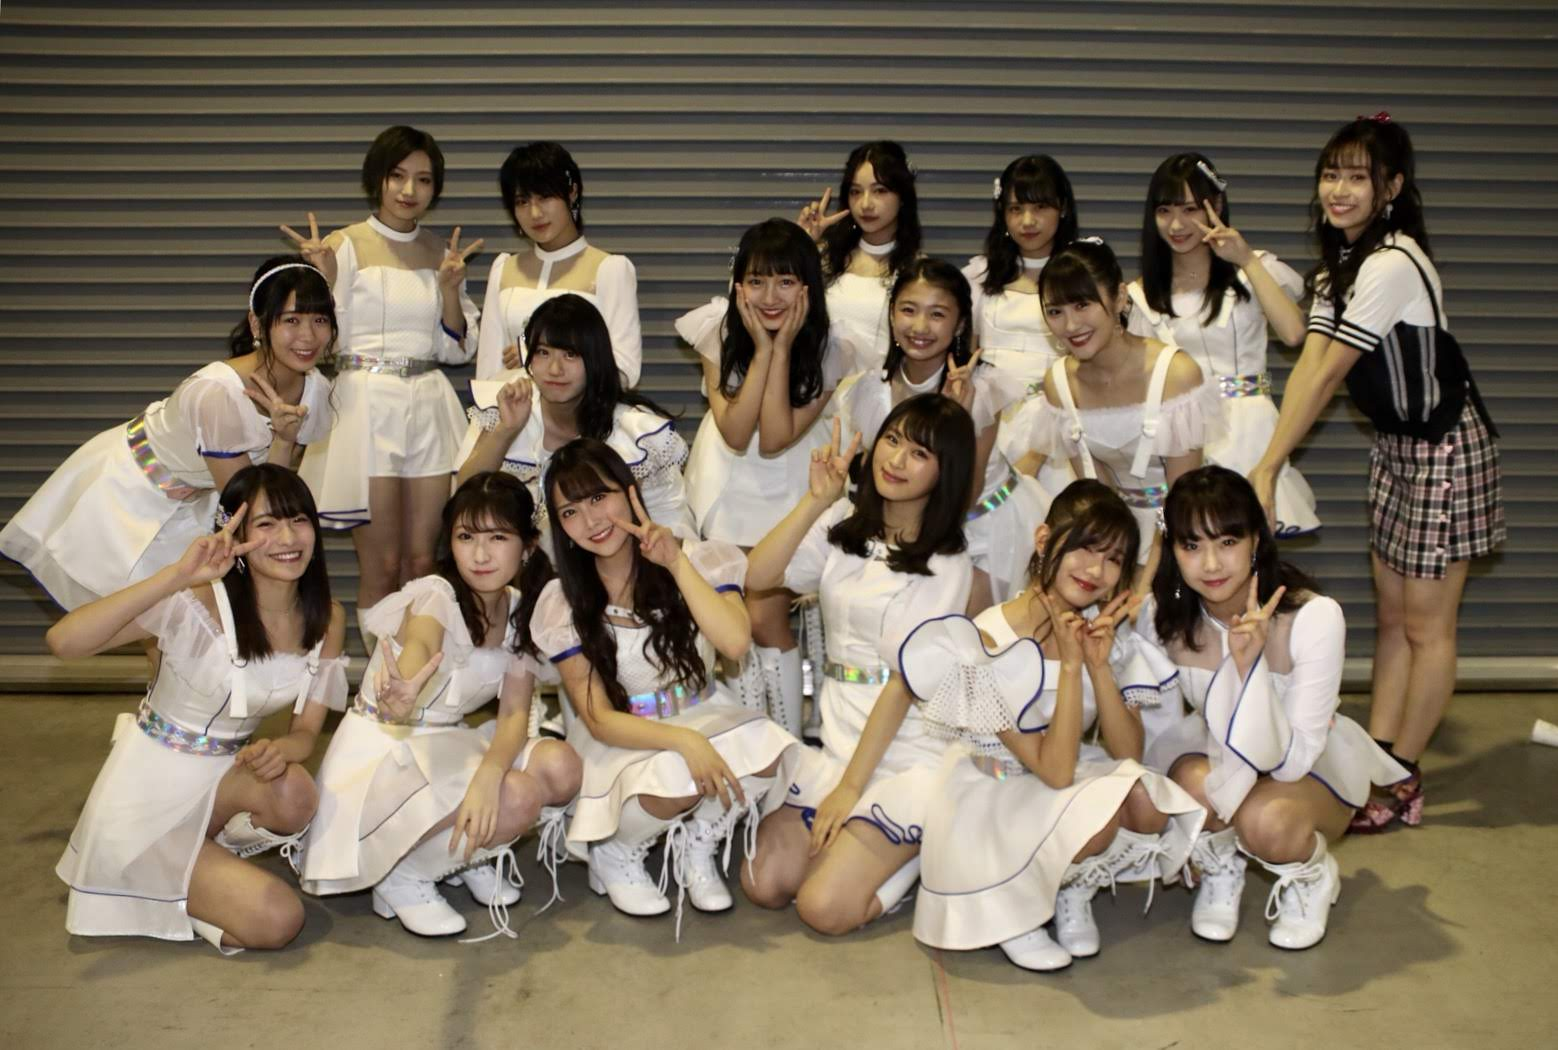 【NMB48】第8回AKB48紅白対抗歌合戦・金子支配人Googleフォト投稿NMB48メンバーの画像。